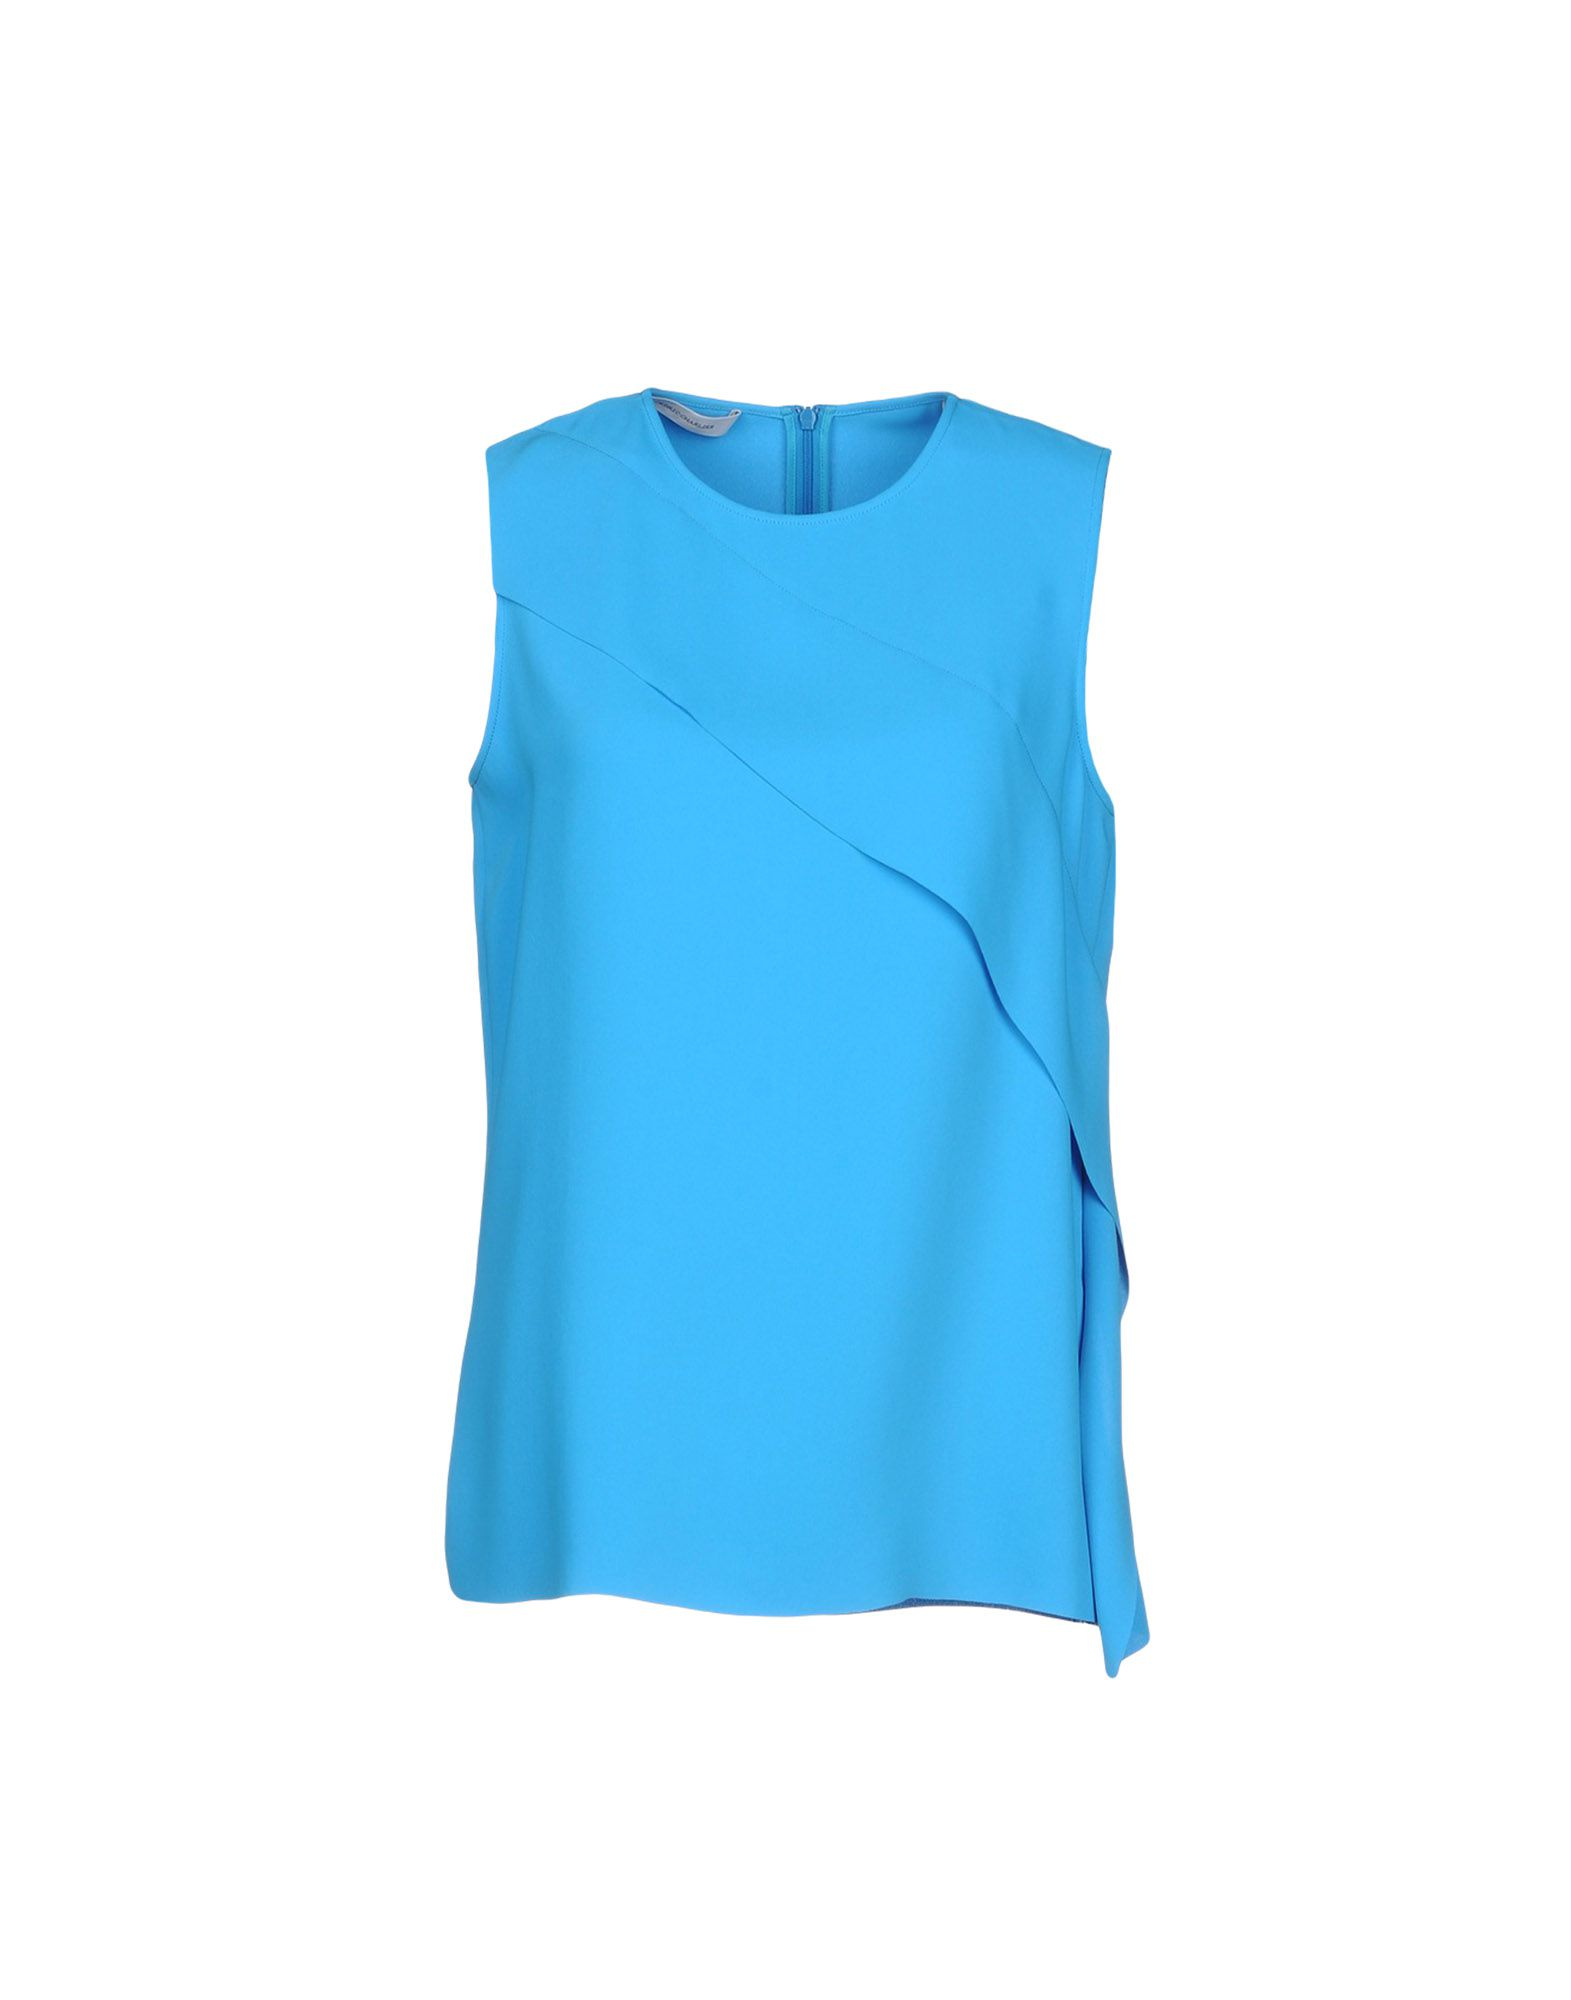 CEDRIC CHARLIER Топ без рукавов cedric charlier пиджак